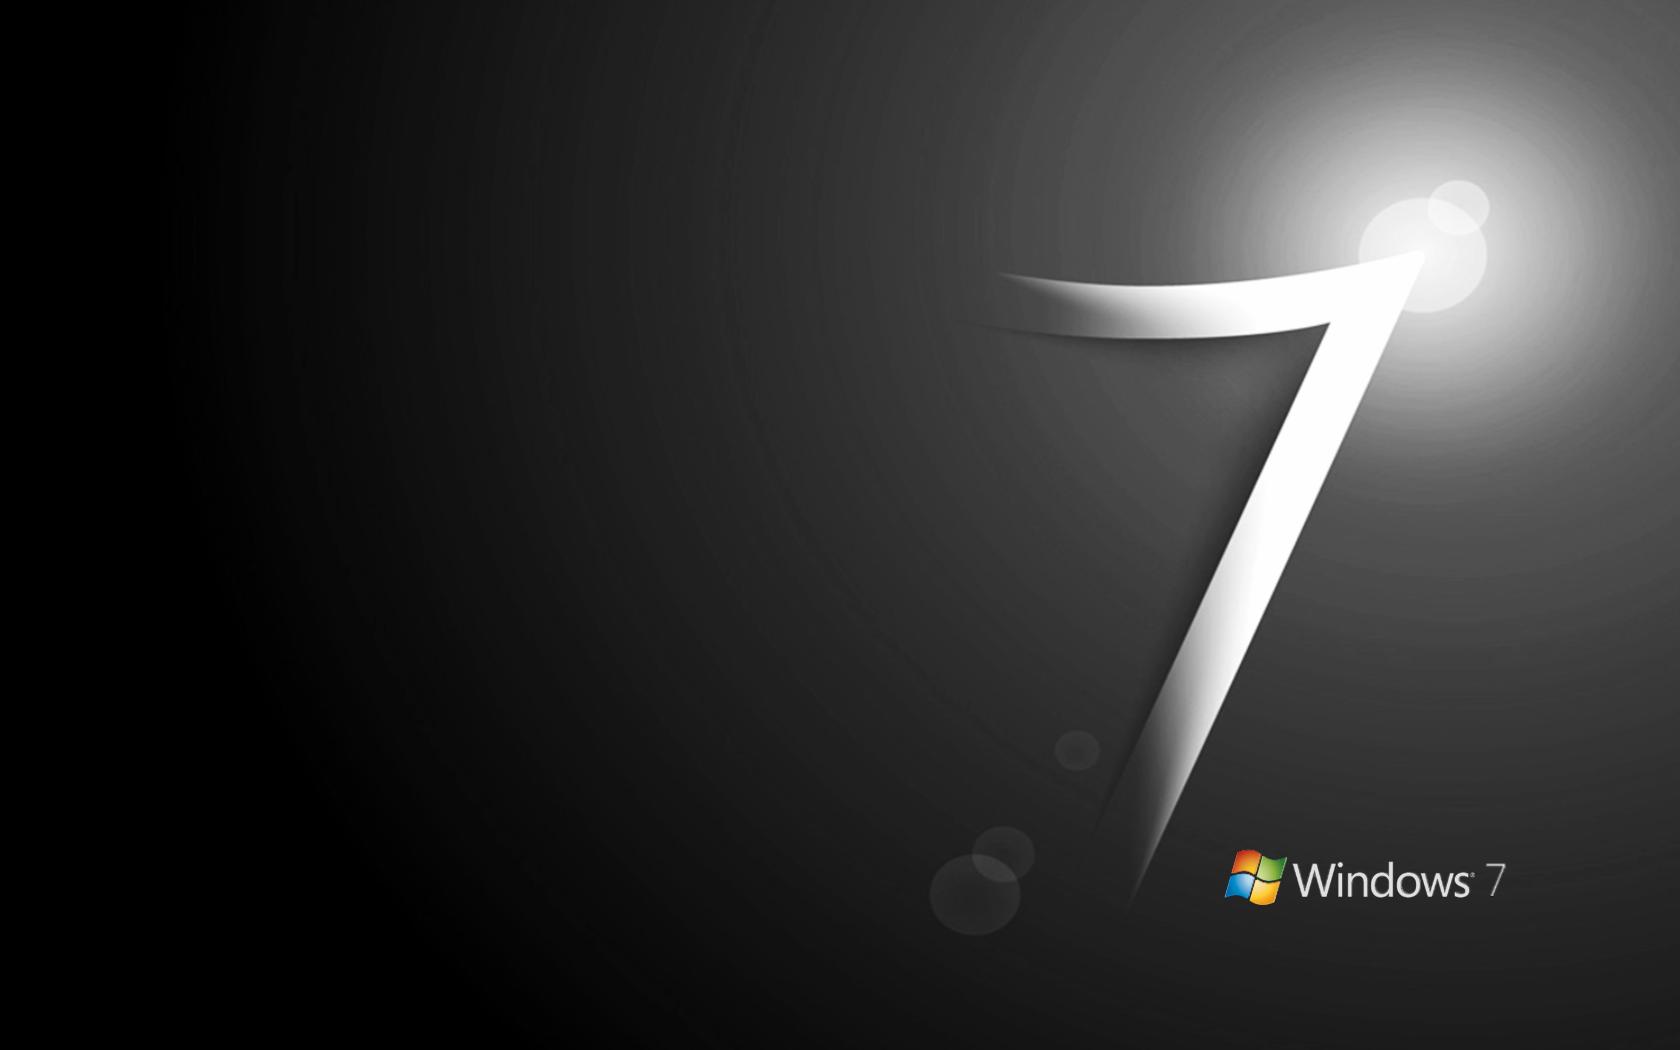 windows xp经典桌面 最美图片网图片